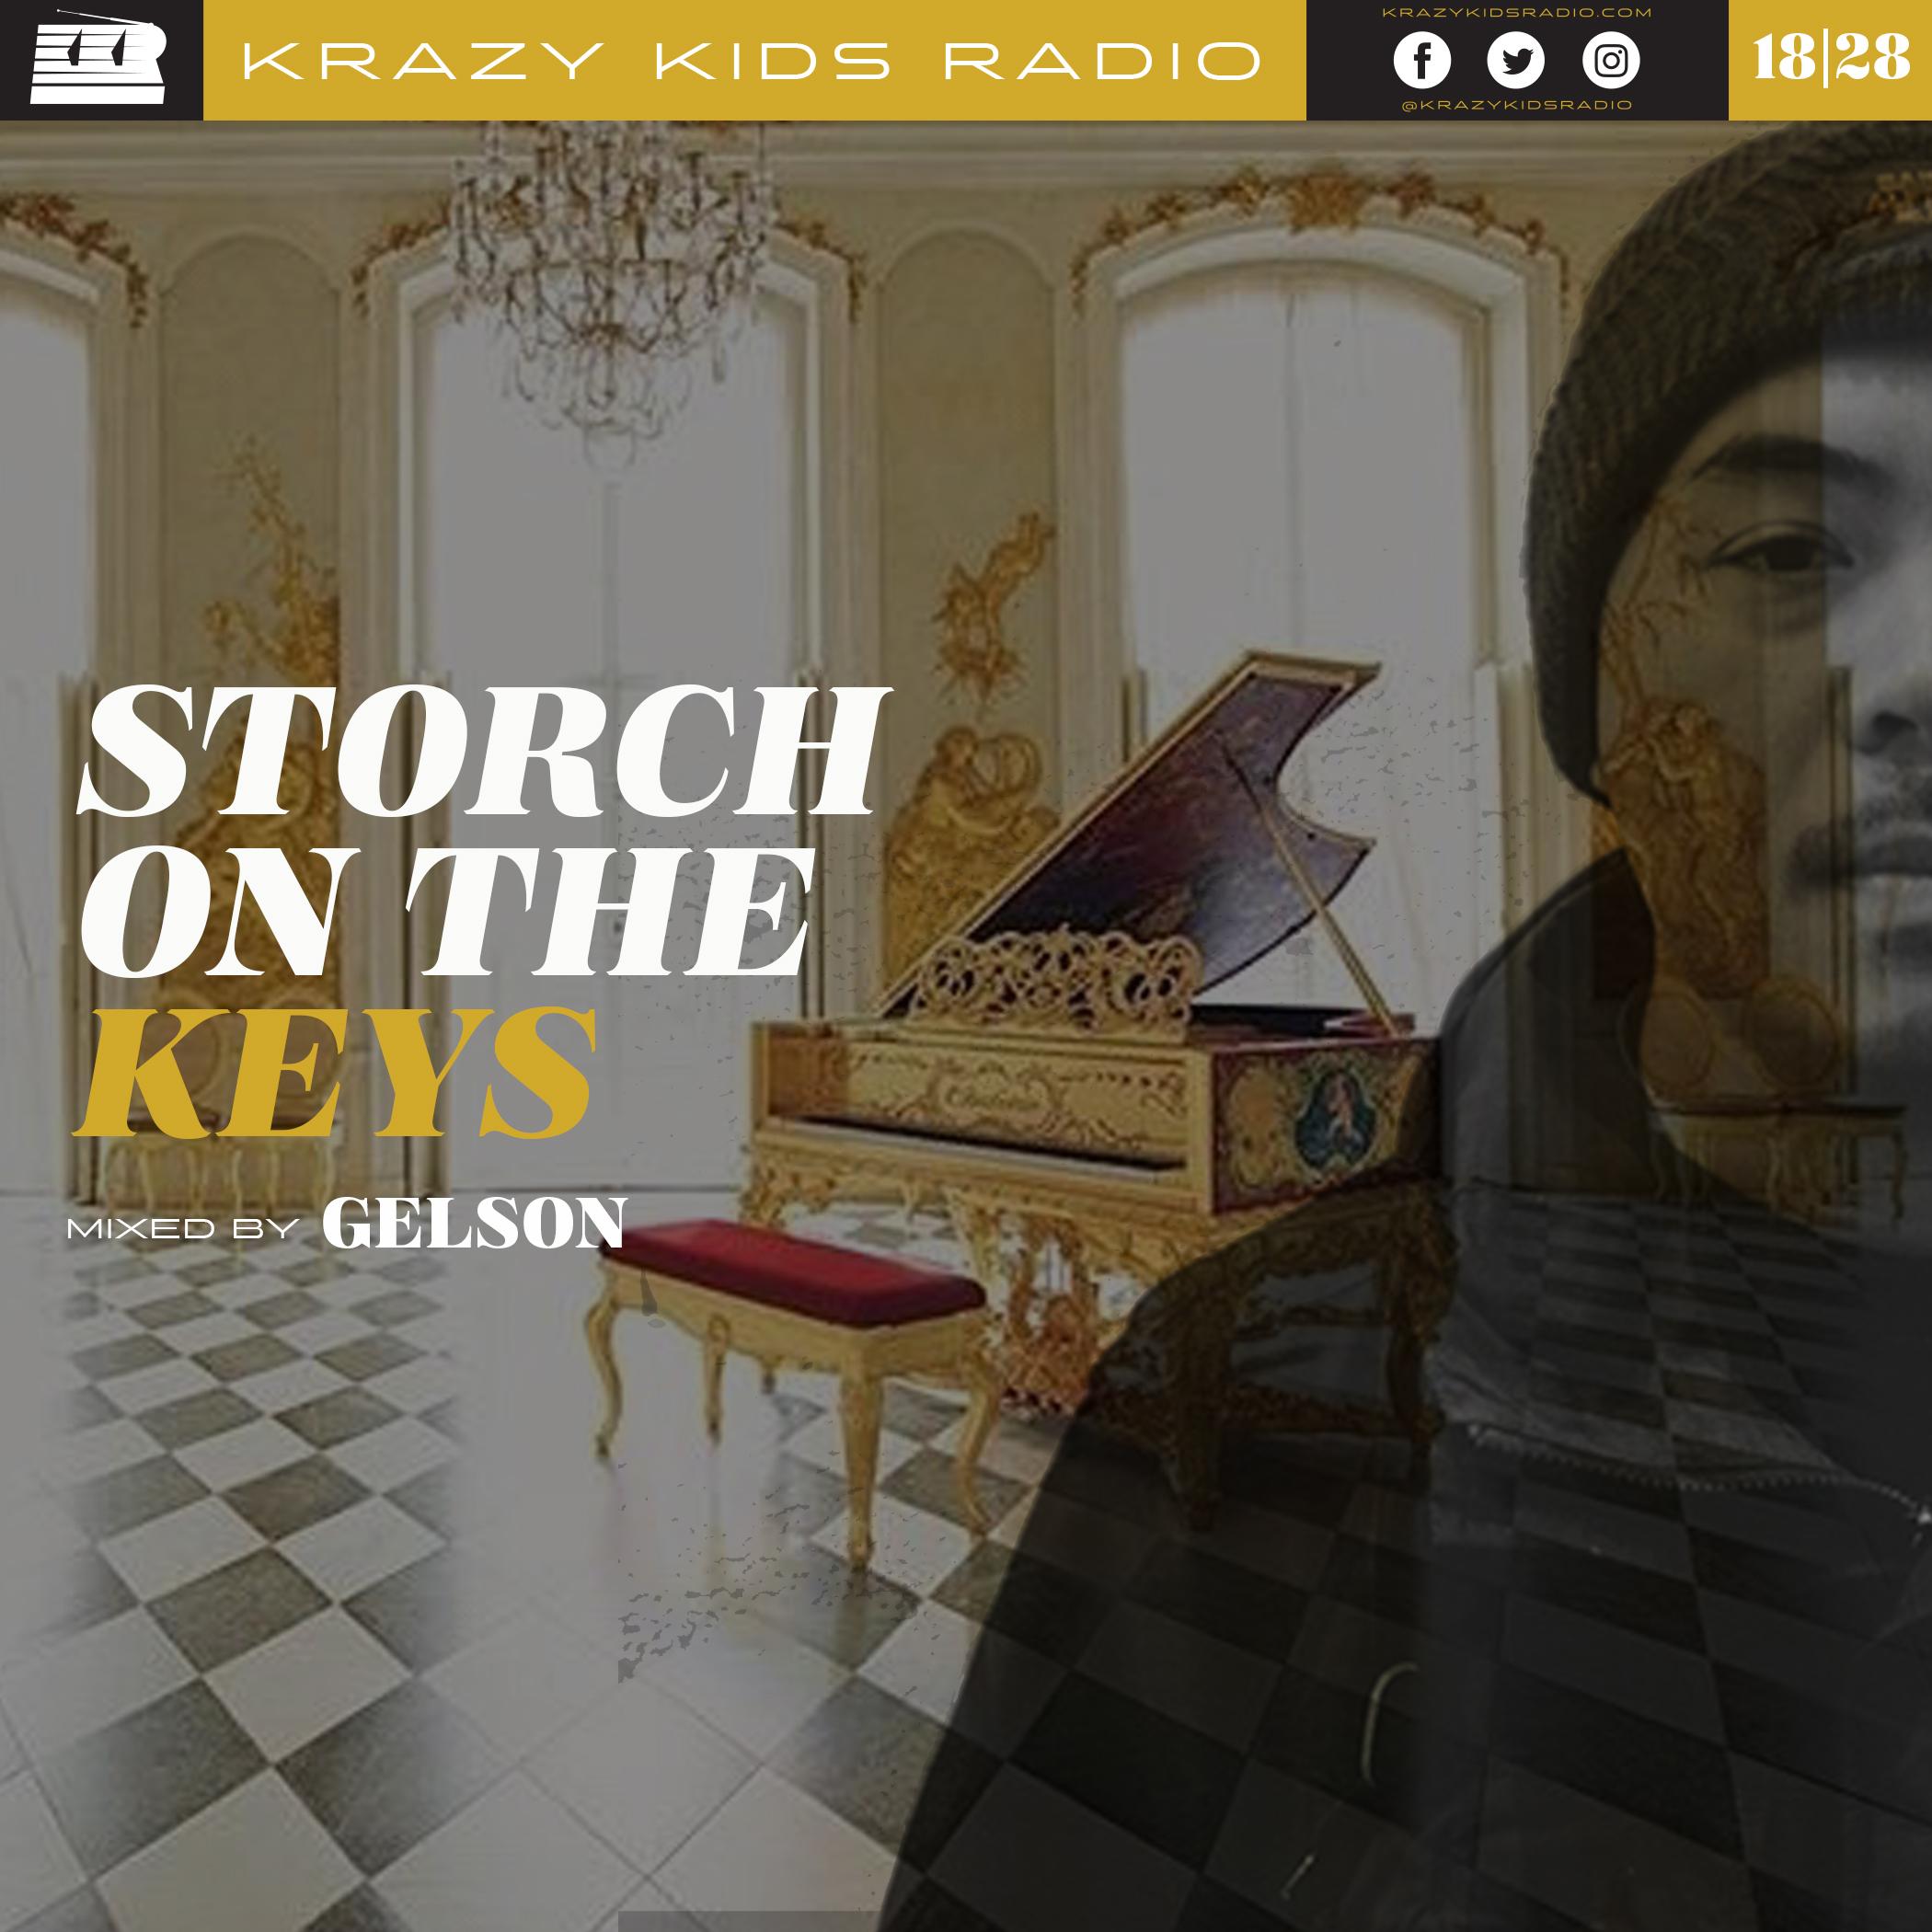 KKR_STORCH-ON-THE-KEYS.jpg